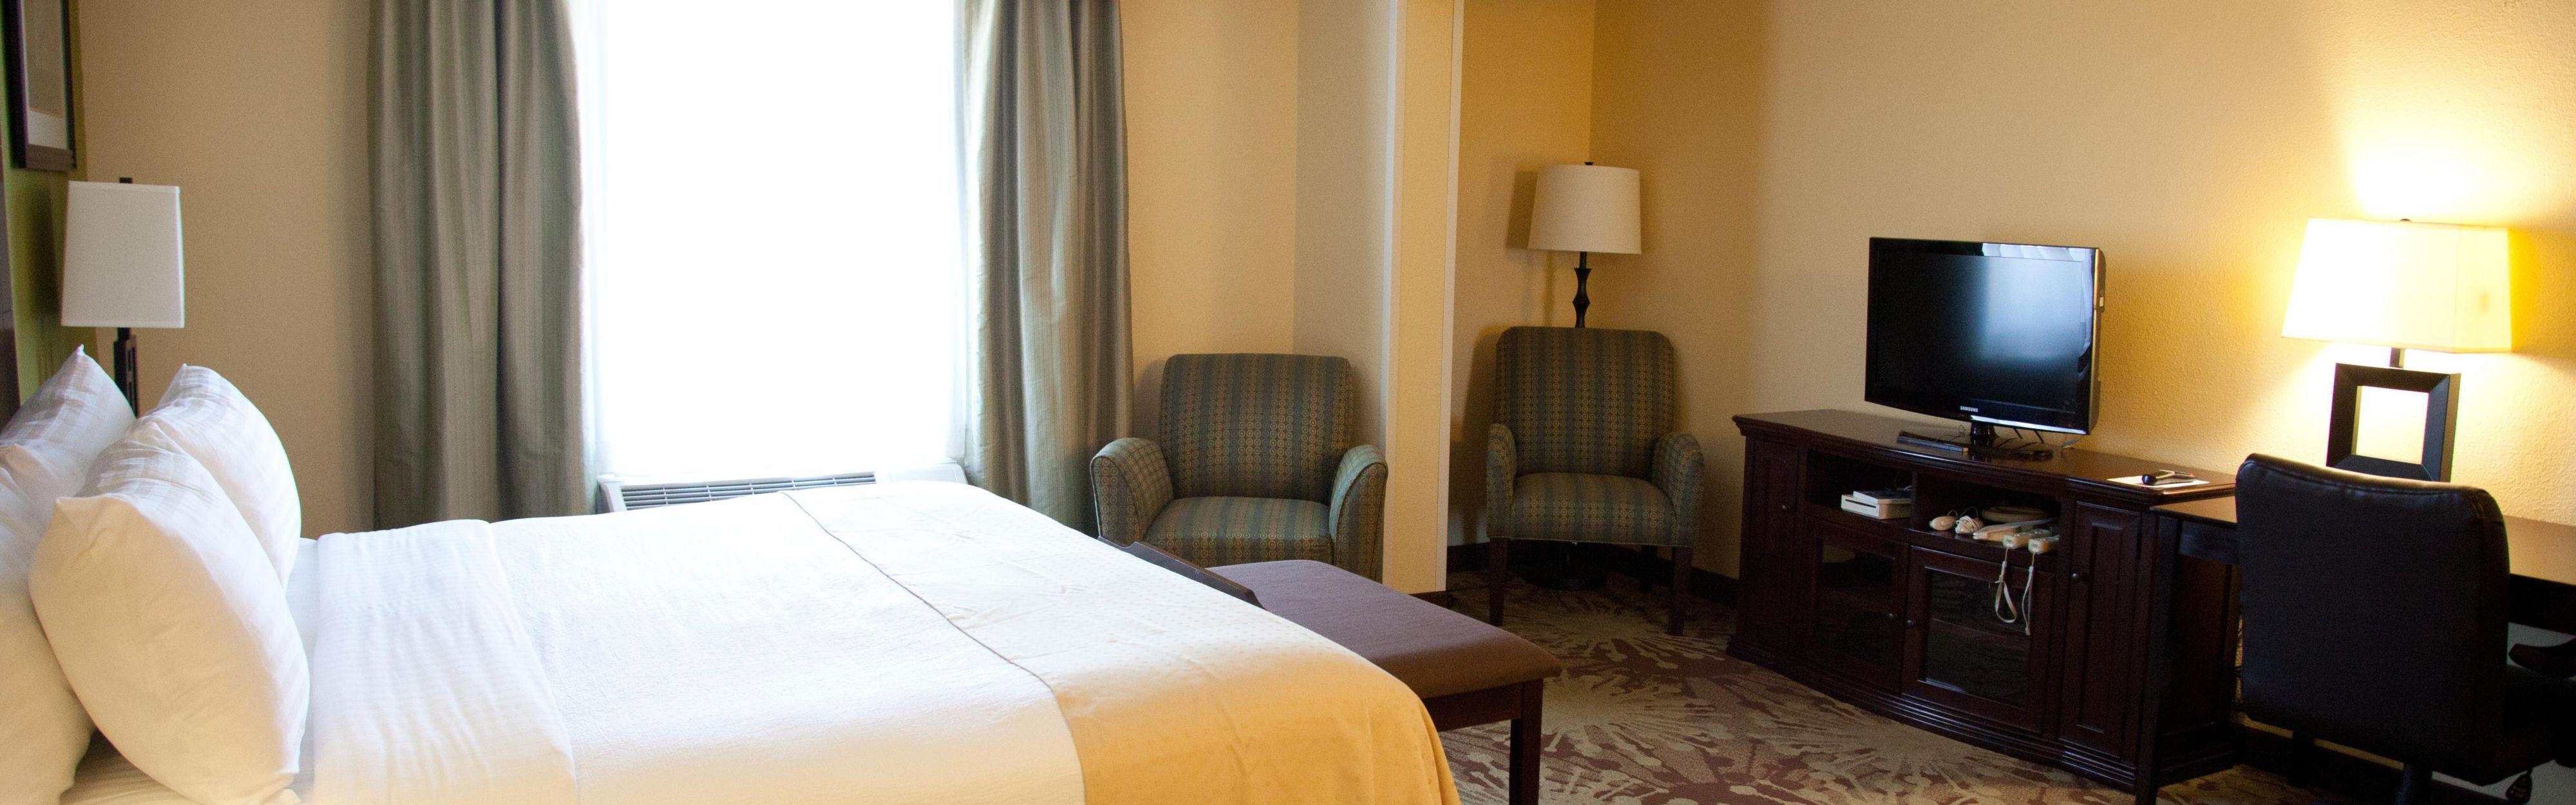 Holiday Inn Gurnee Convention Center image 1